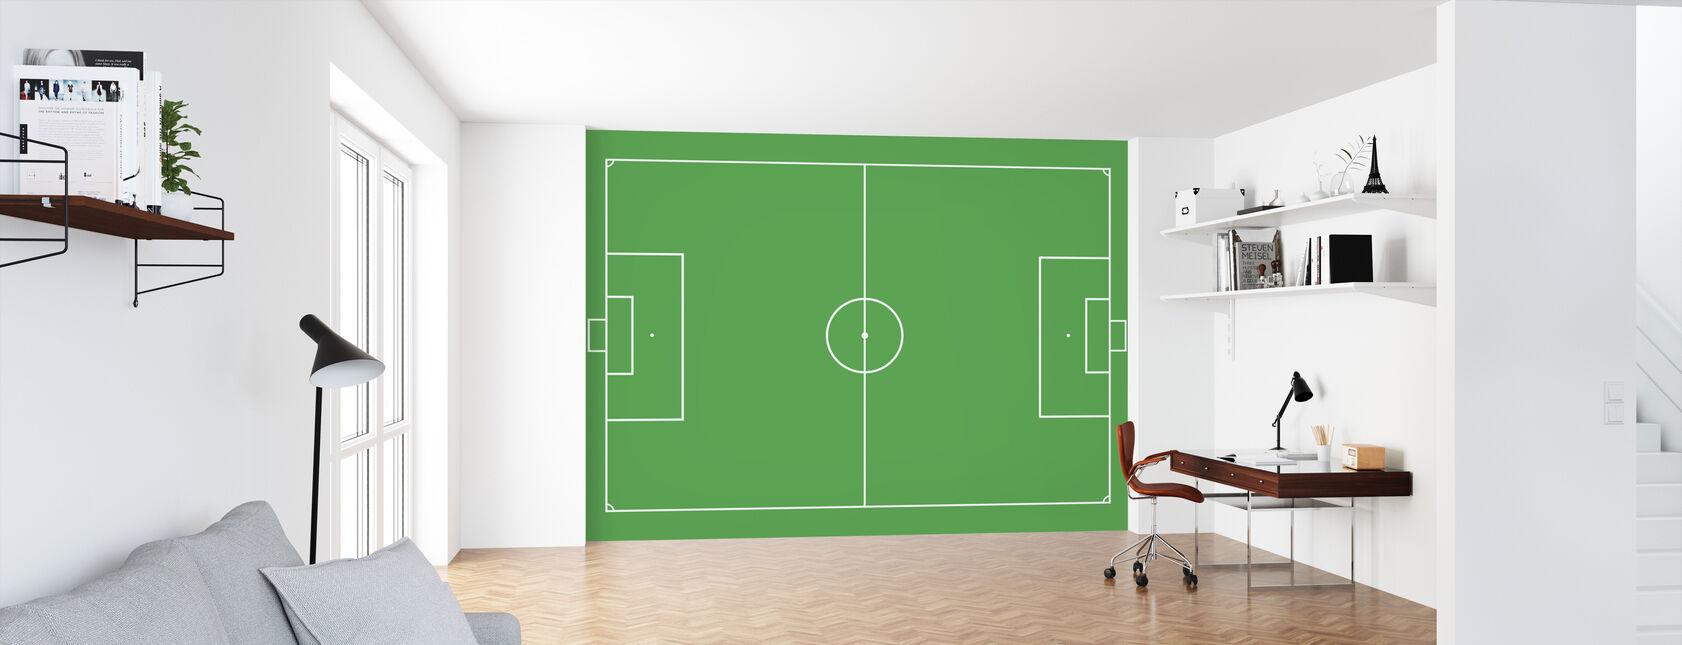 Soccer Field - Wallpaper - Office